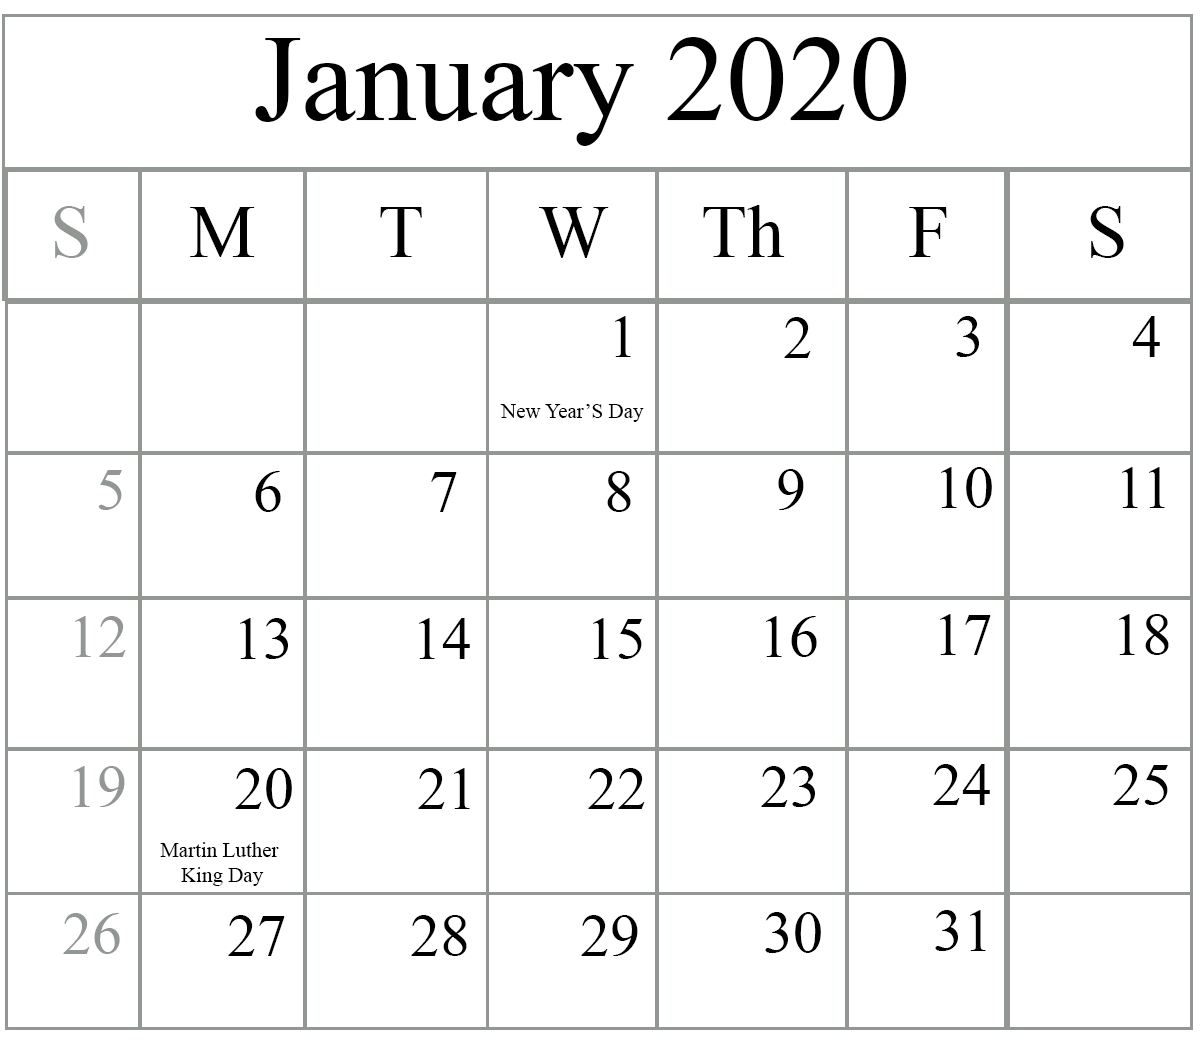 Free Fillable 2020 Calendar Template | Calendar Template Fillable Blank Calendar Template